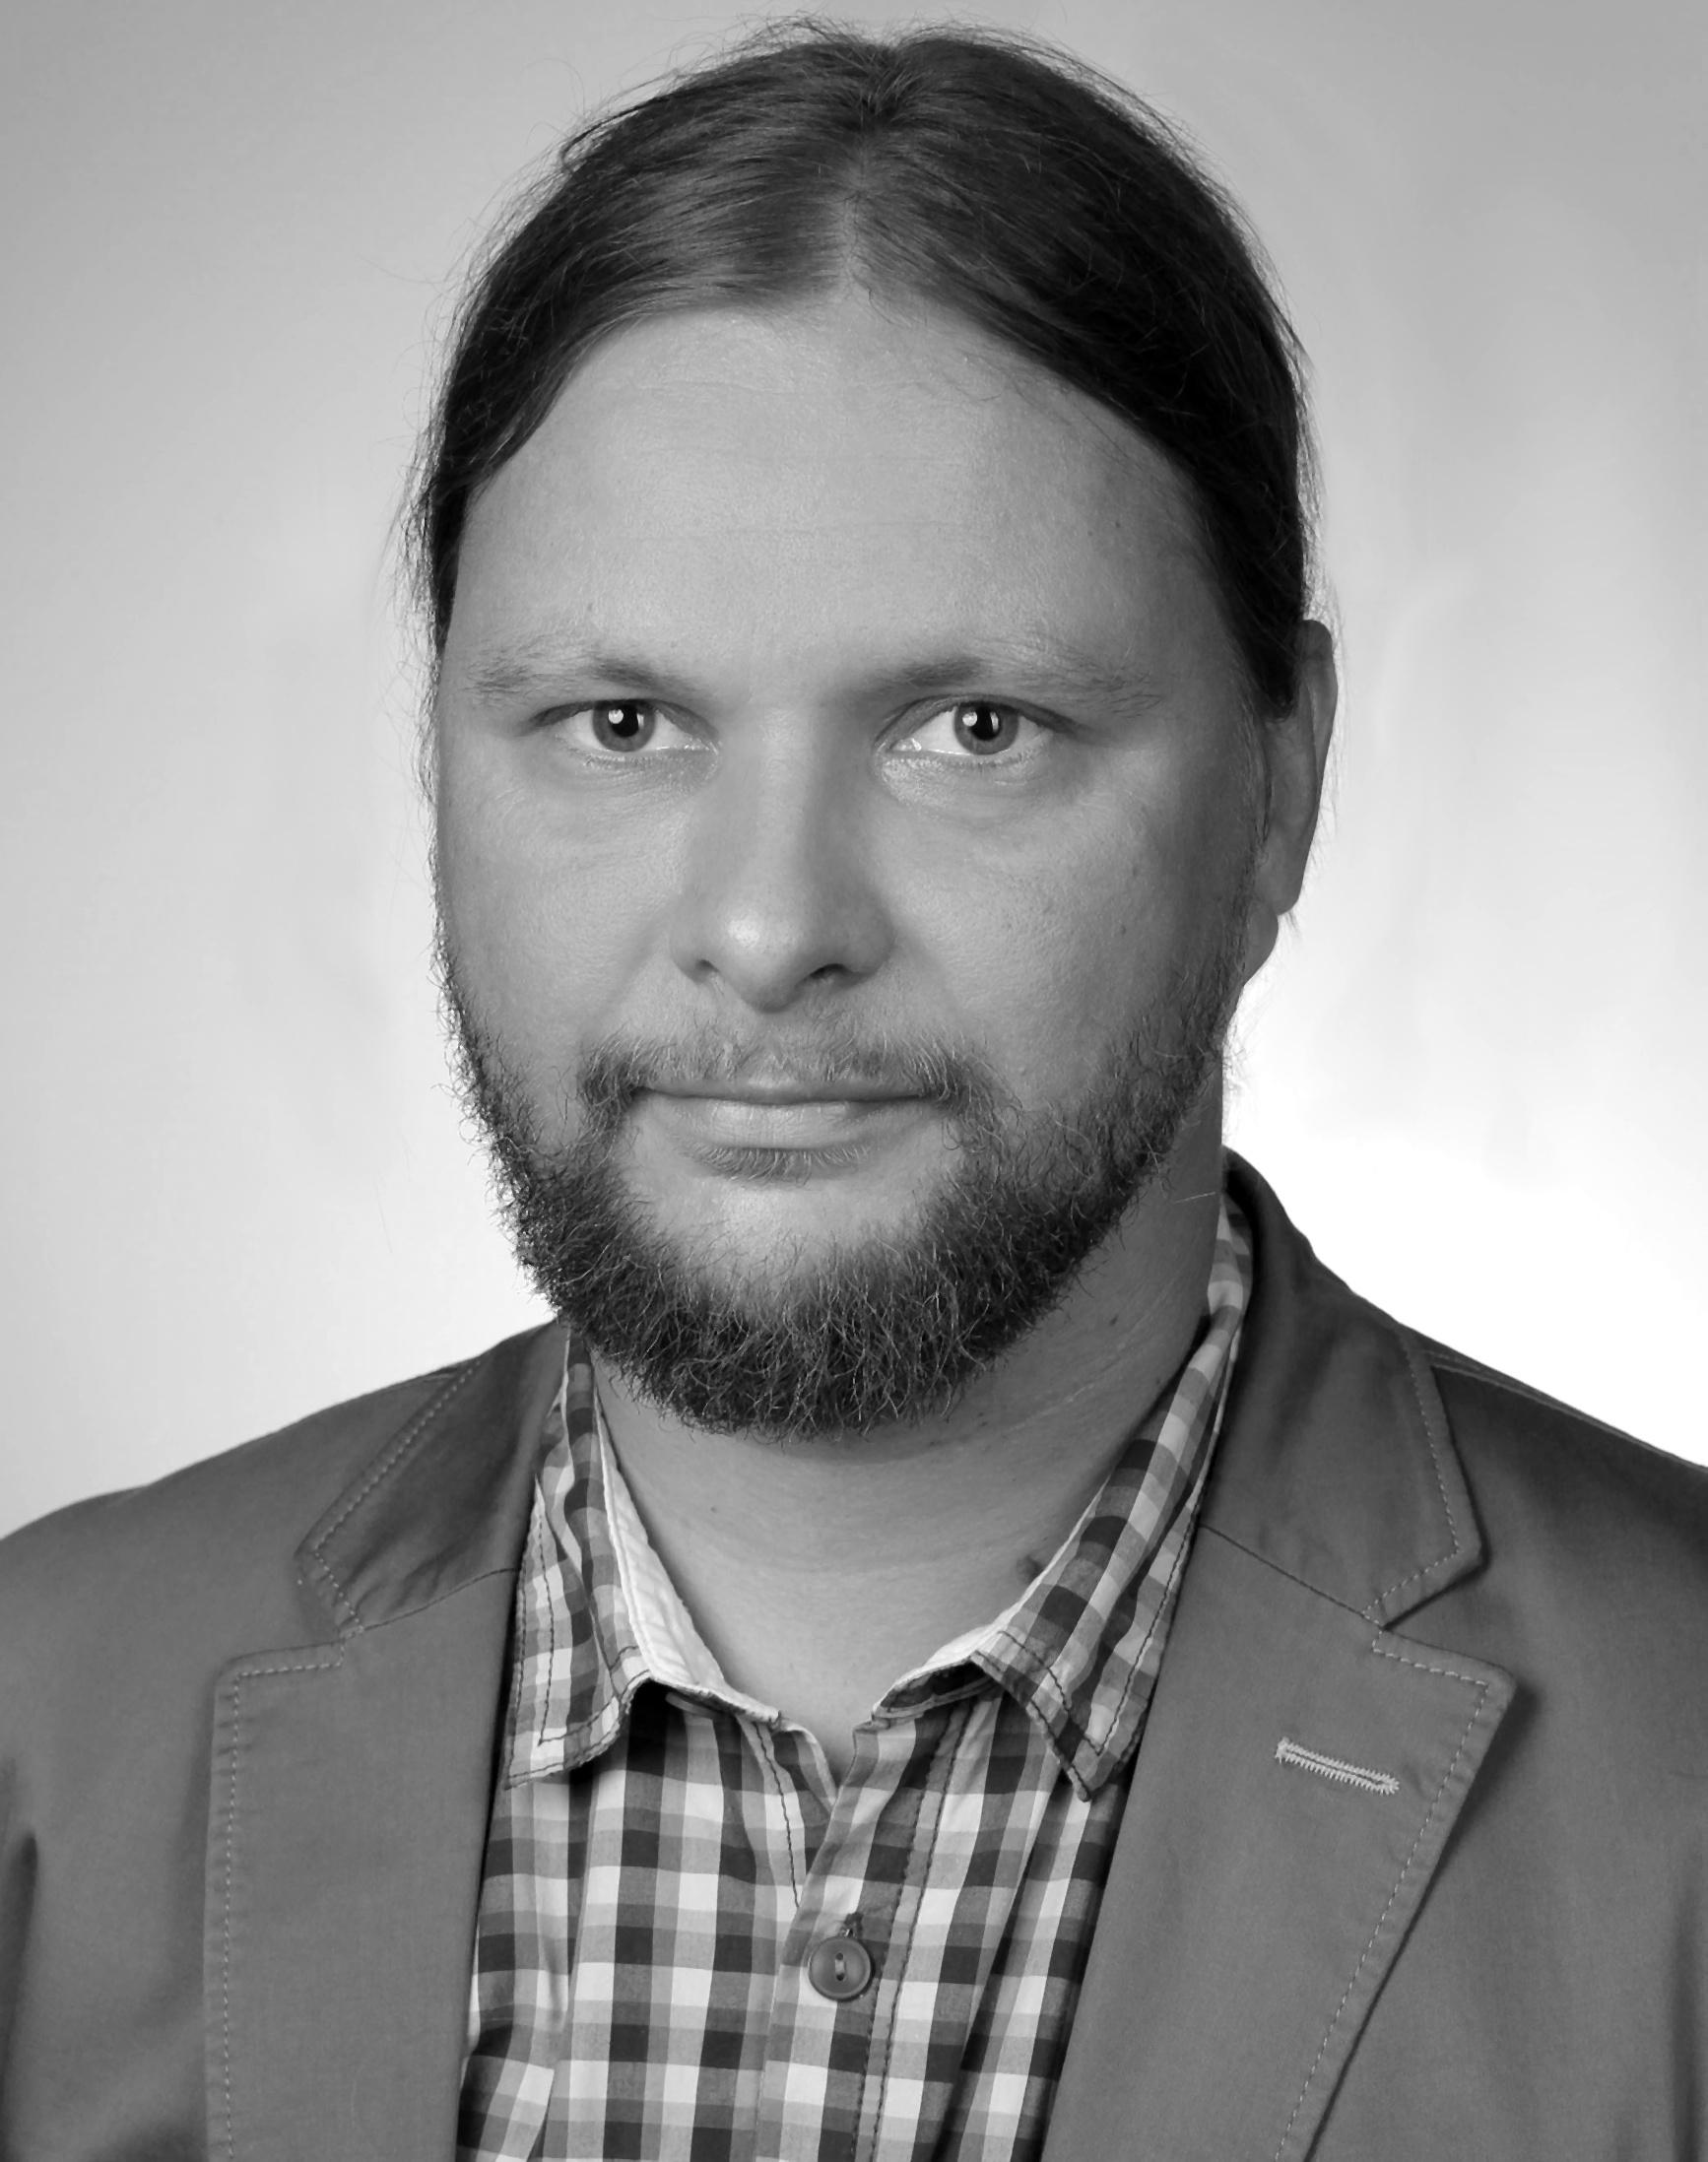 Michal Taterka